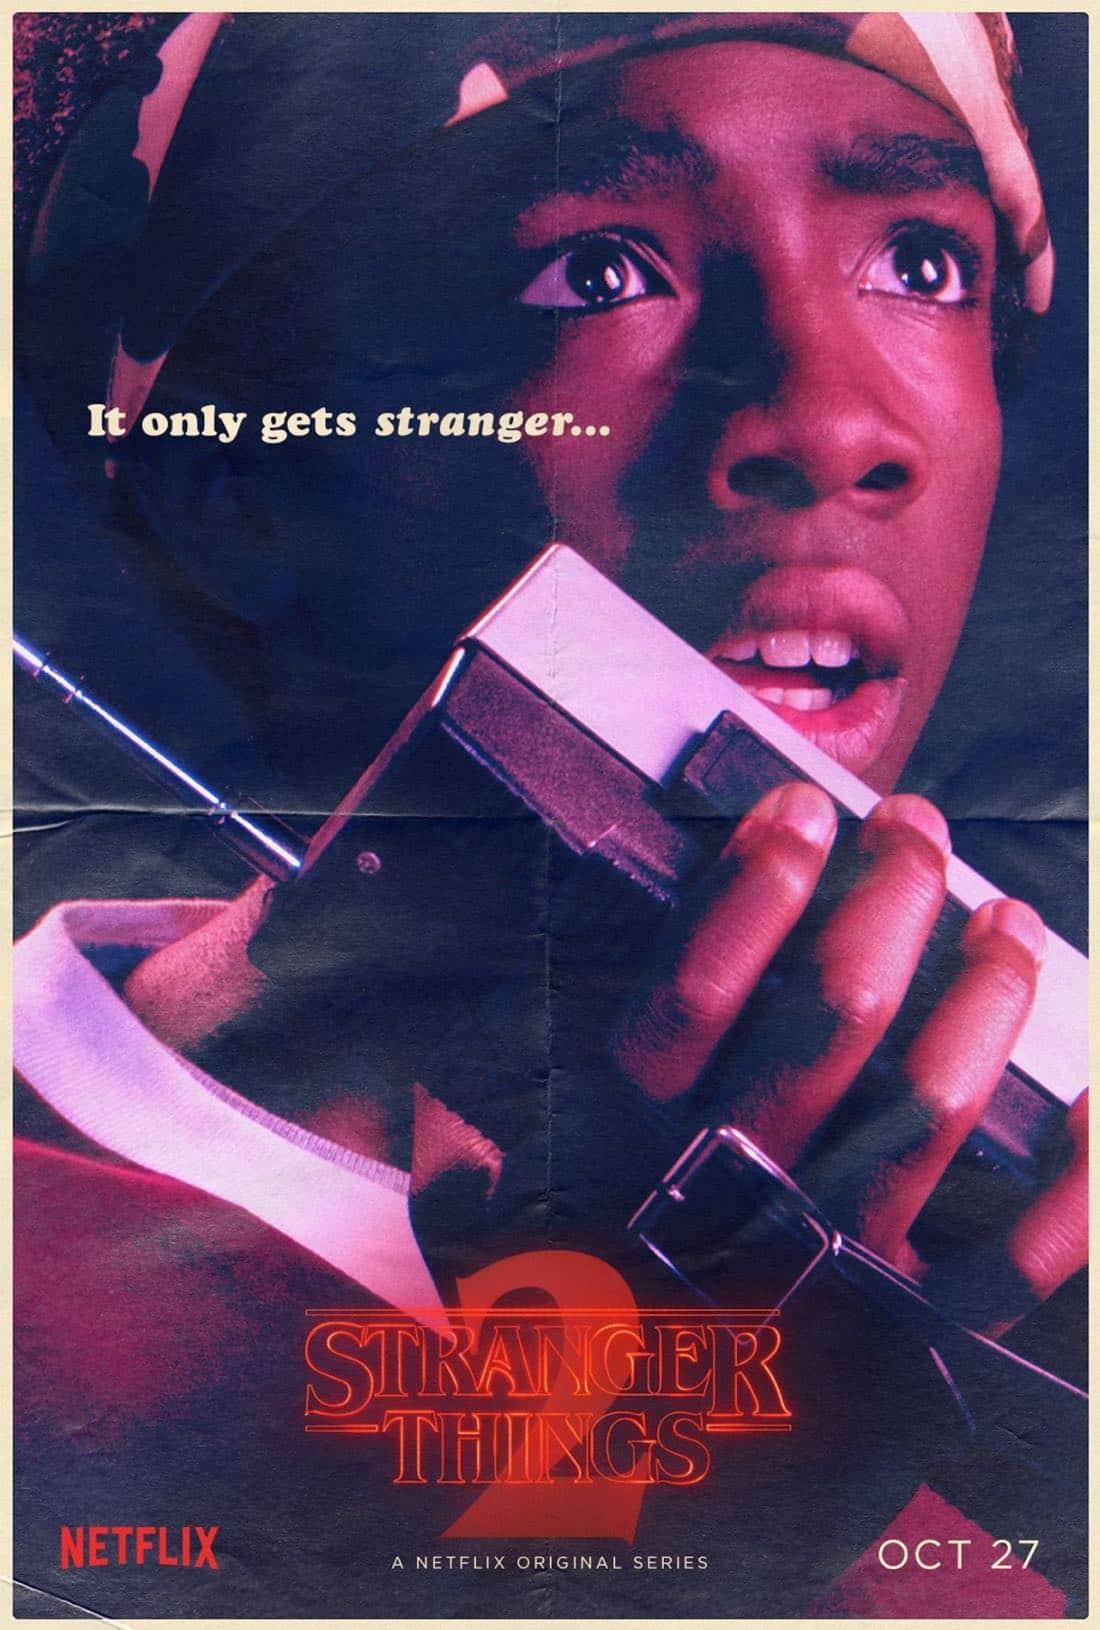 Stranger Things Character Poster - Caleb McLaughlin - Lucas